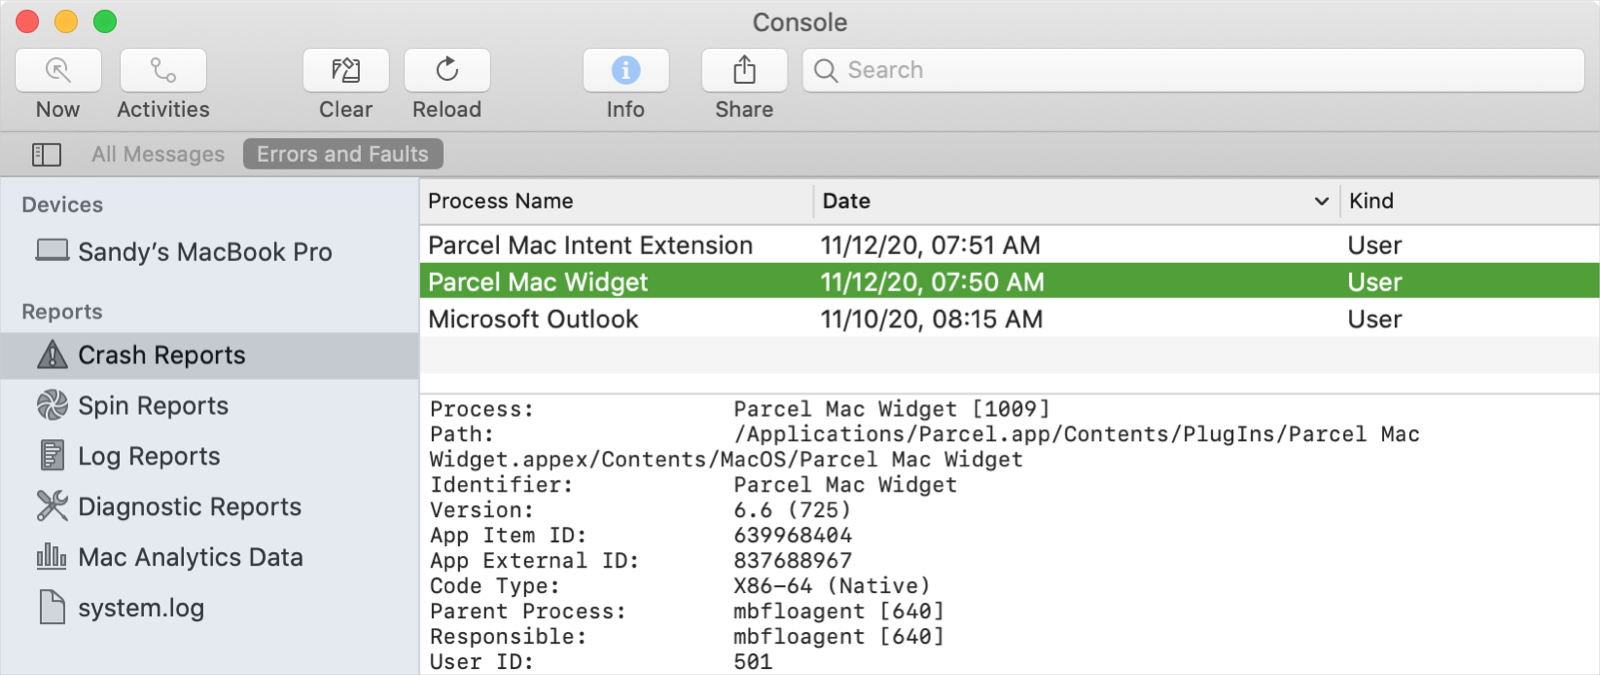 macOS Console Crash Reports